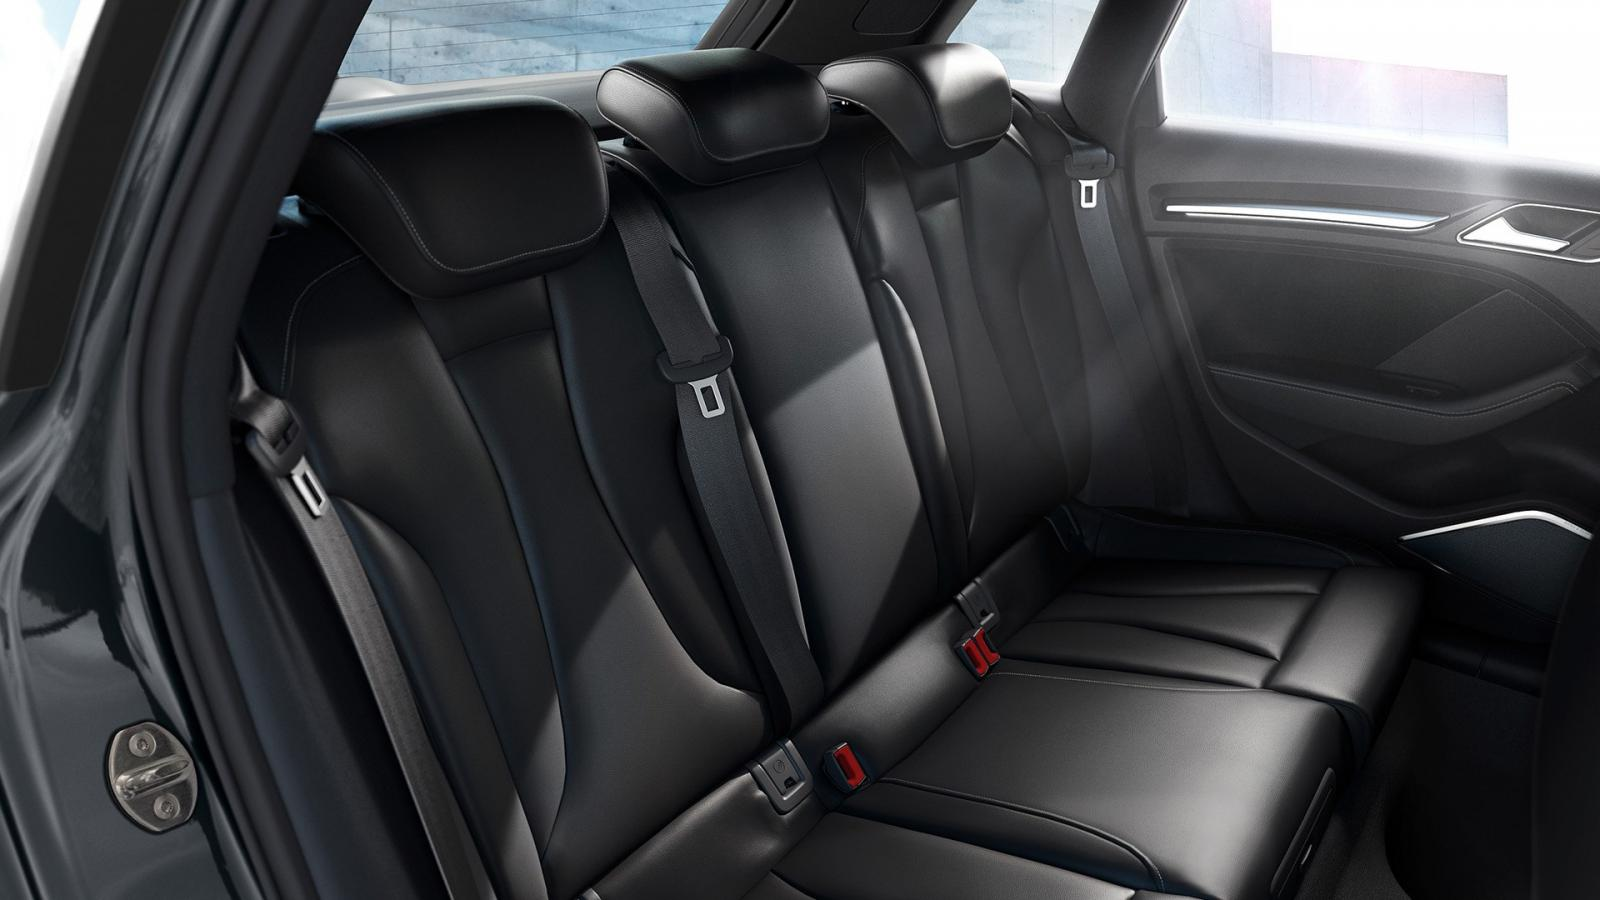 Audi A3 asientos traseros